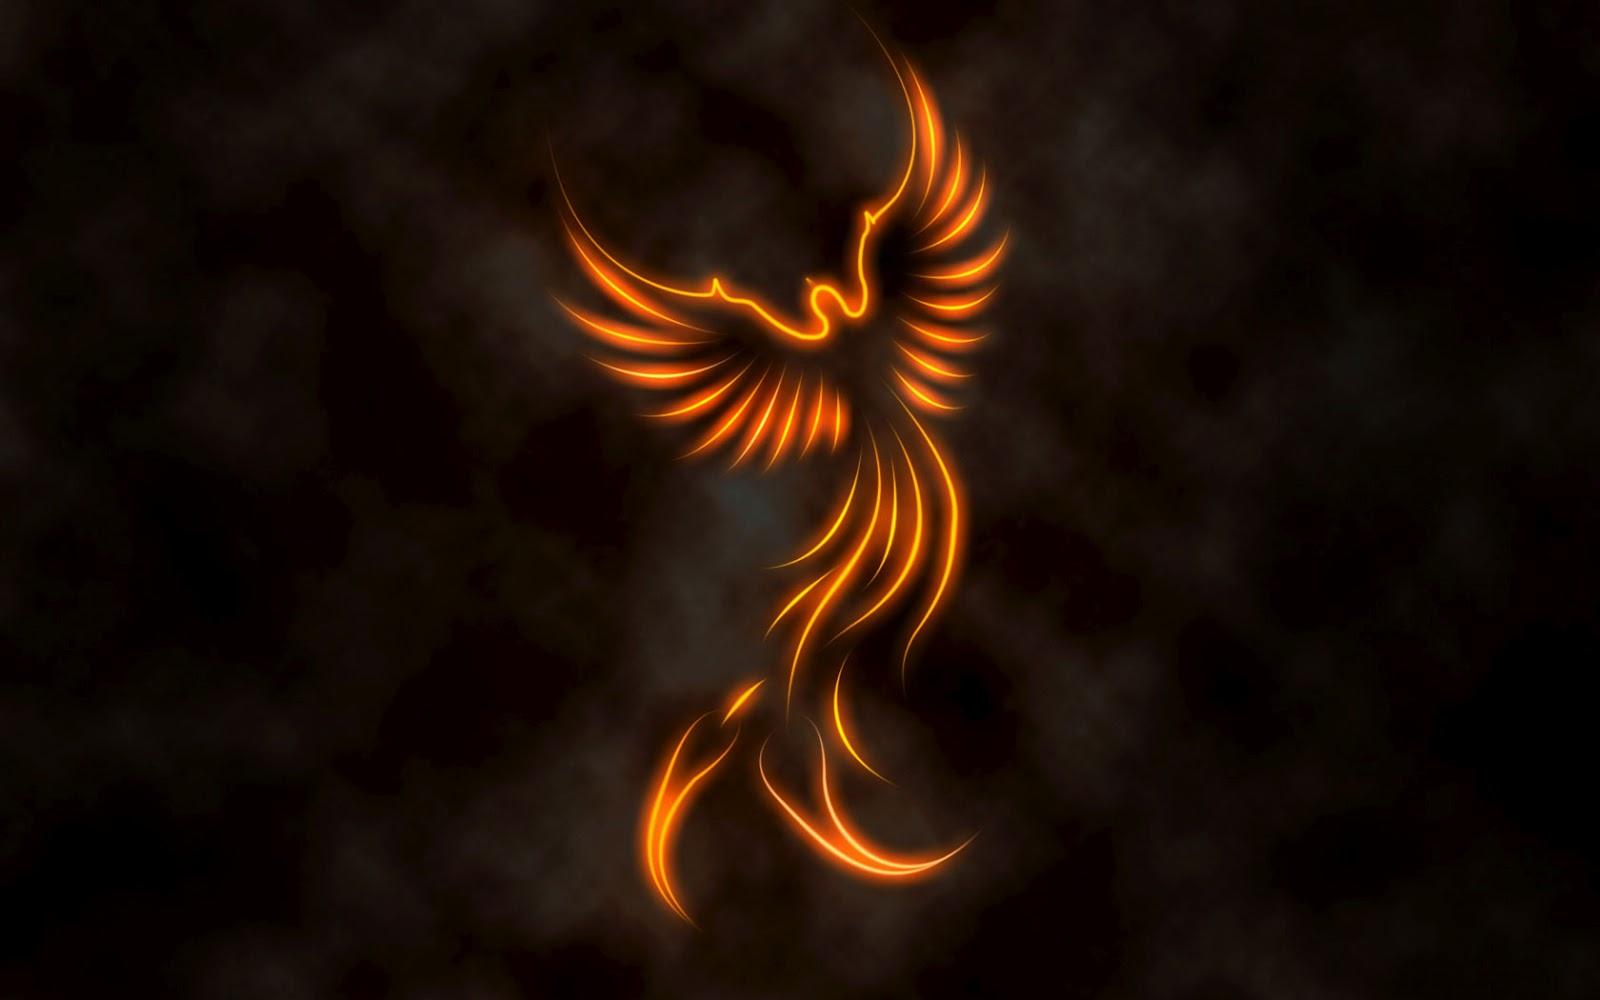 Dark Phoenix Logo The Phoenix Report Why